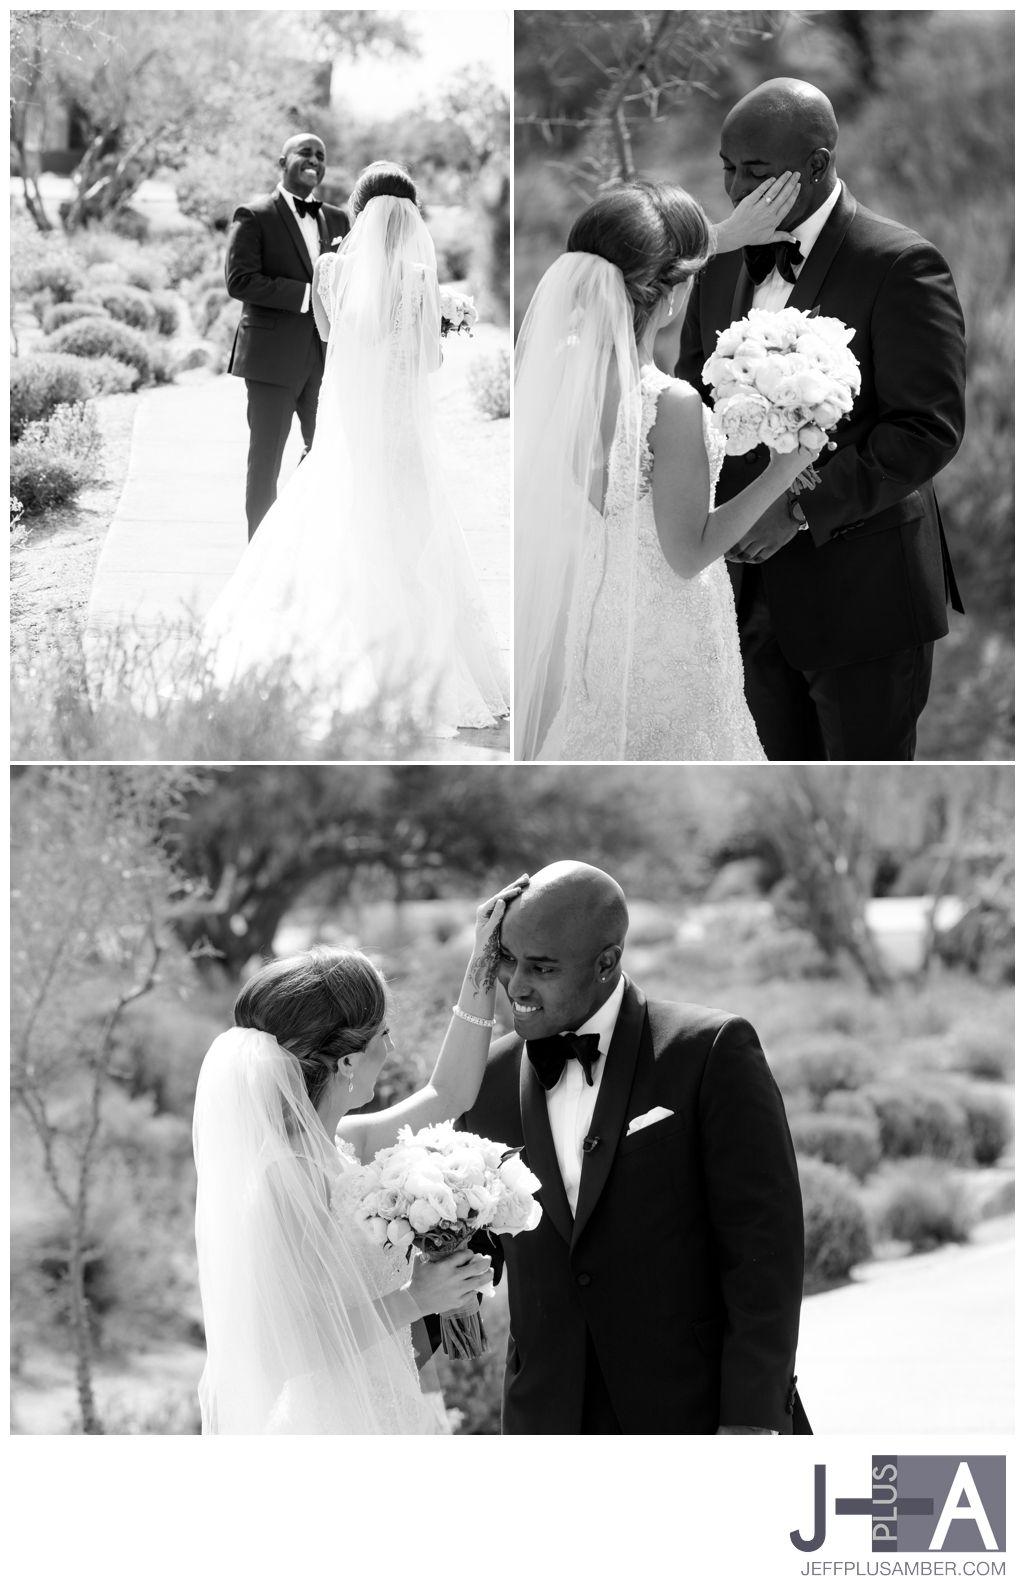 Amber Goetz pinamber goetz on behind my lense | wedding, getting